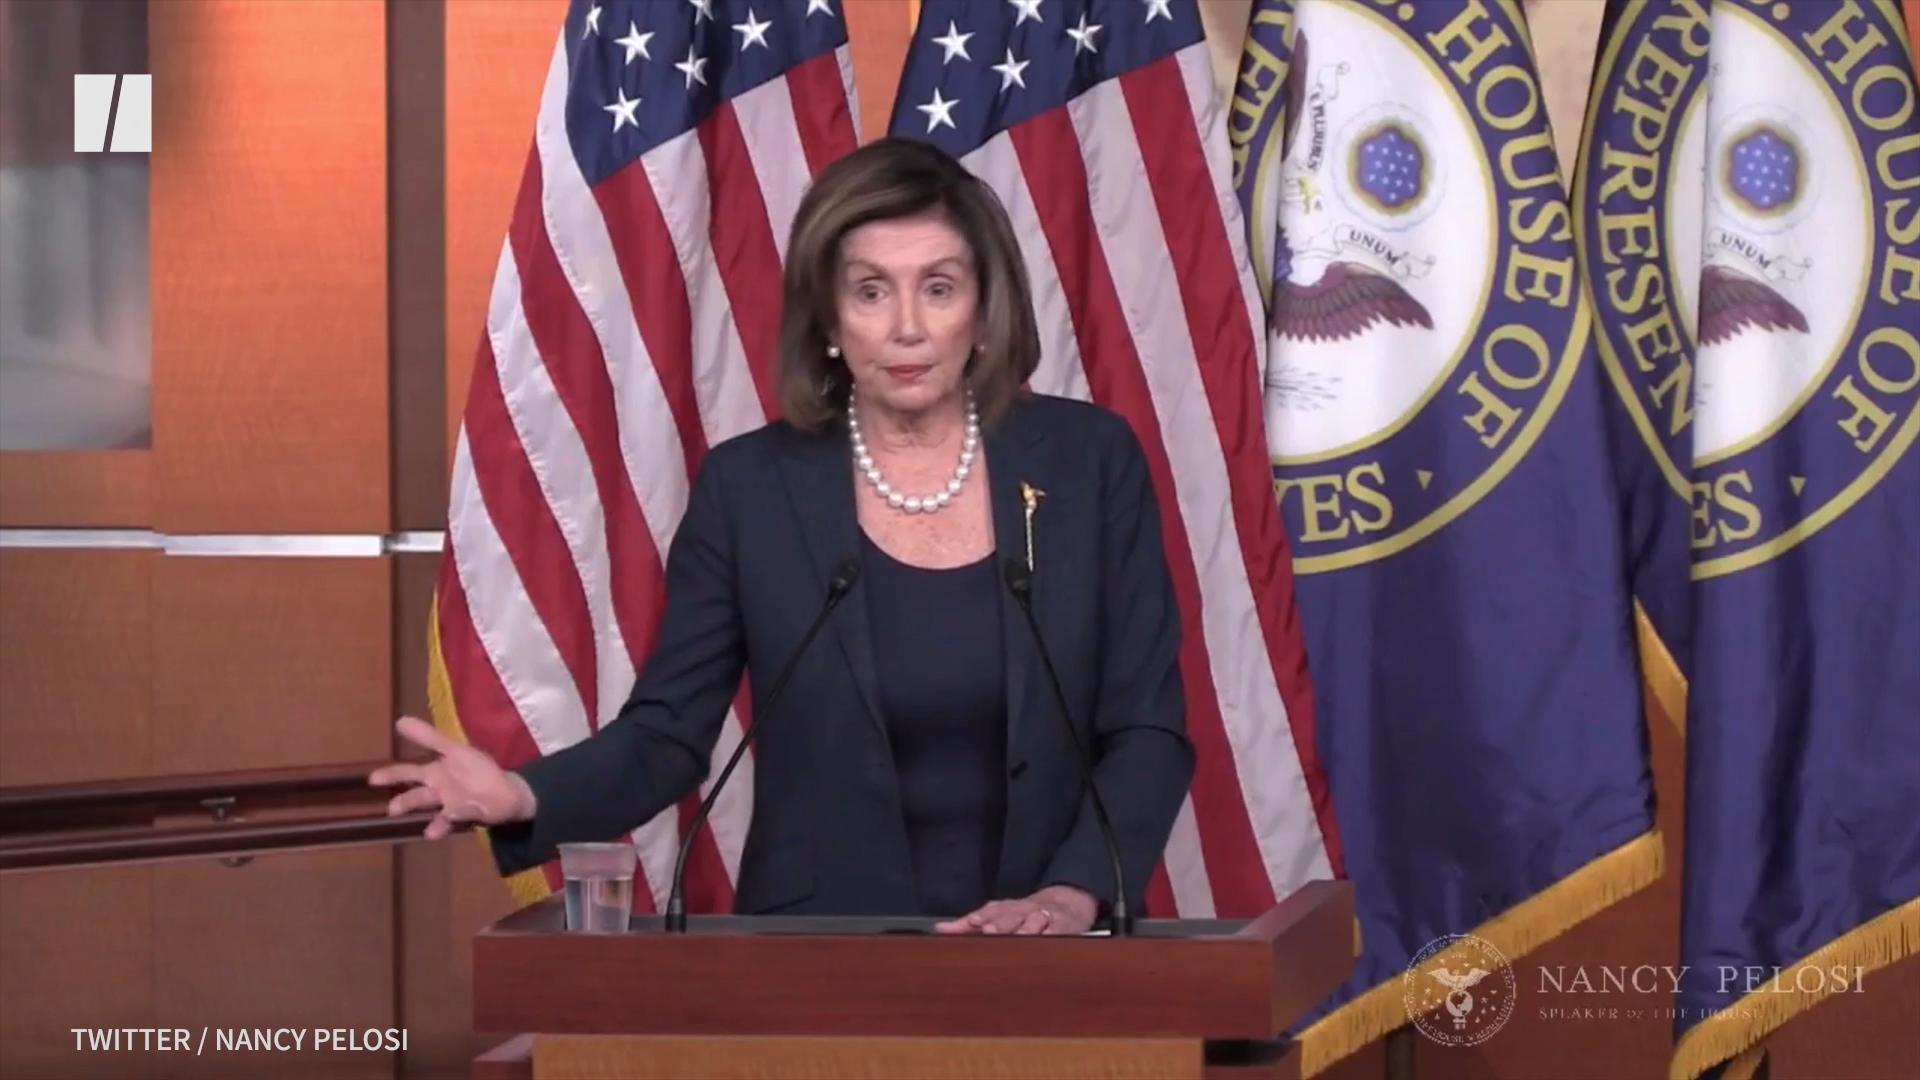 Nancy Pelosi Lays Into 'Shameful' Facebook In Blistering Remarks